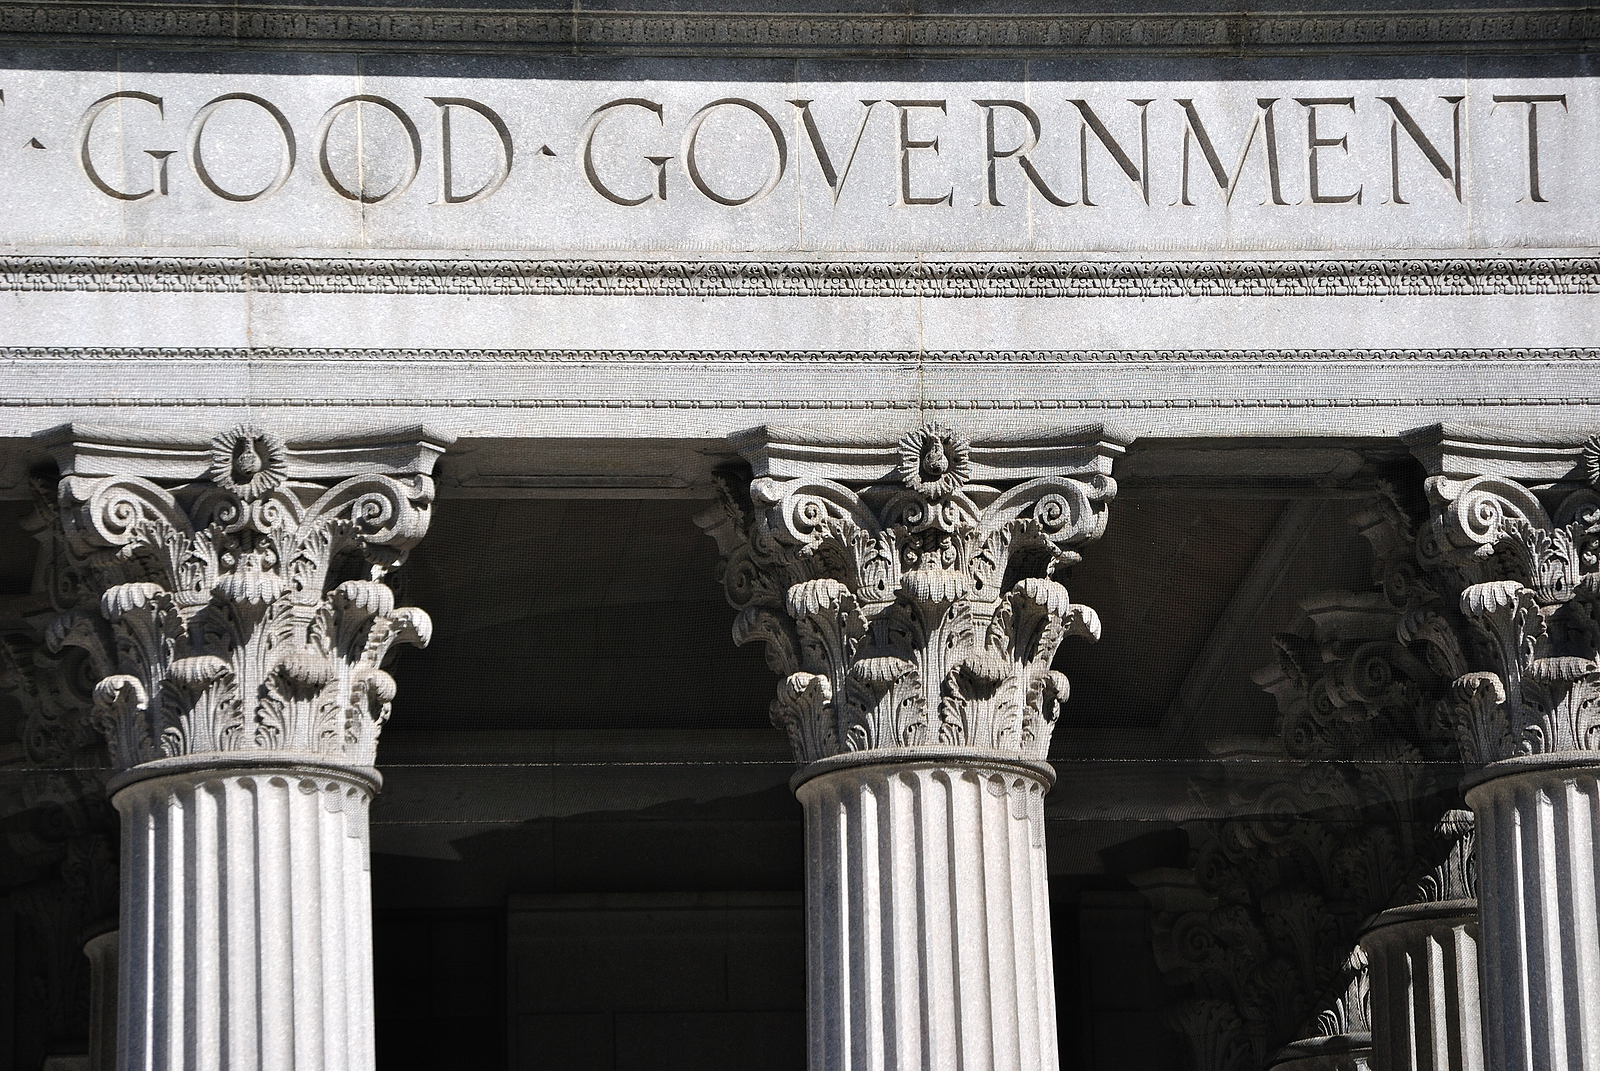 Thrift Savings Plan government